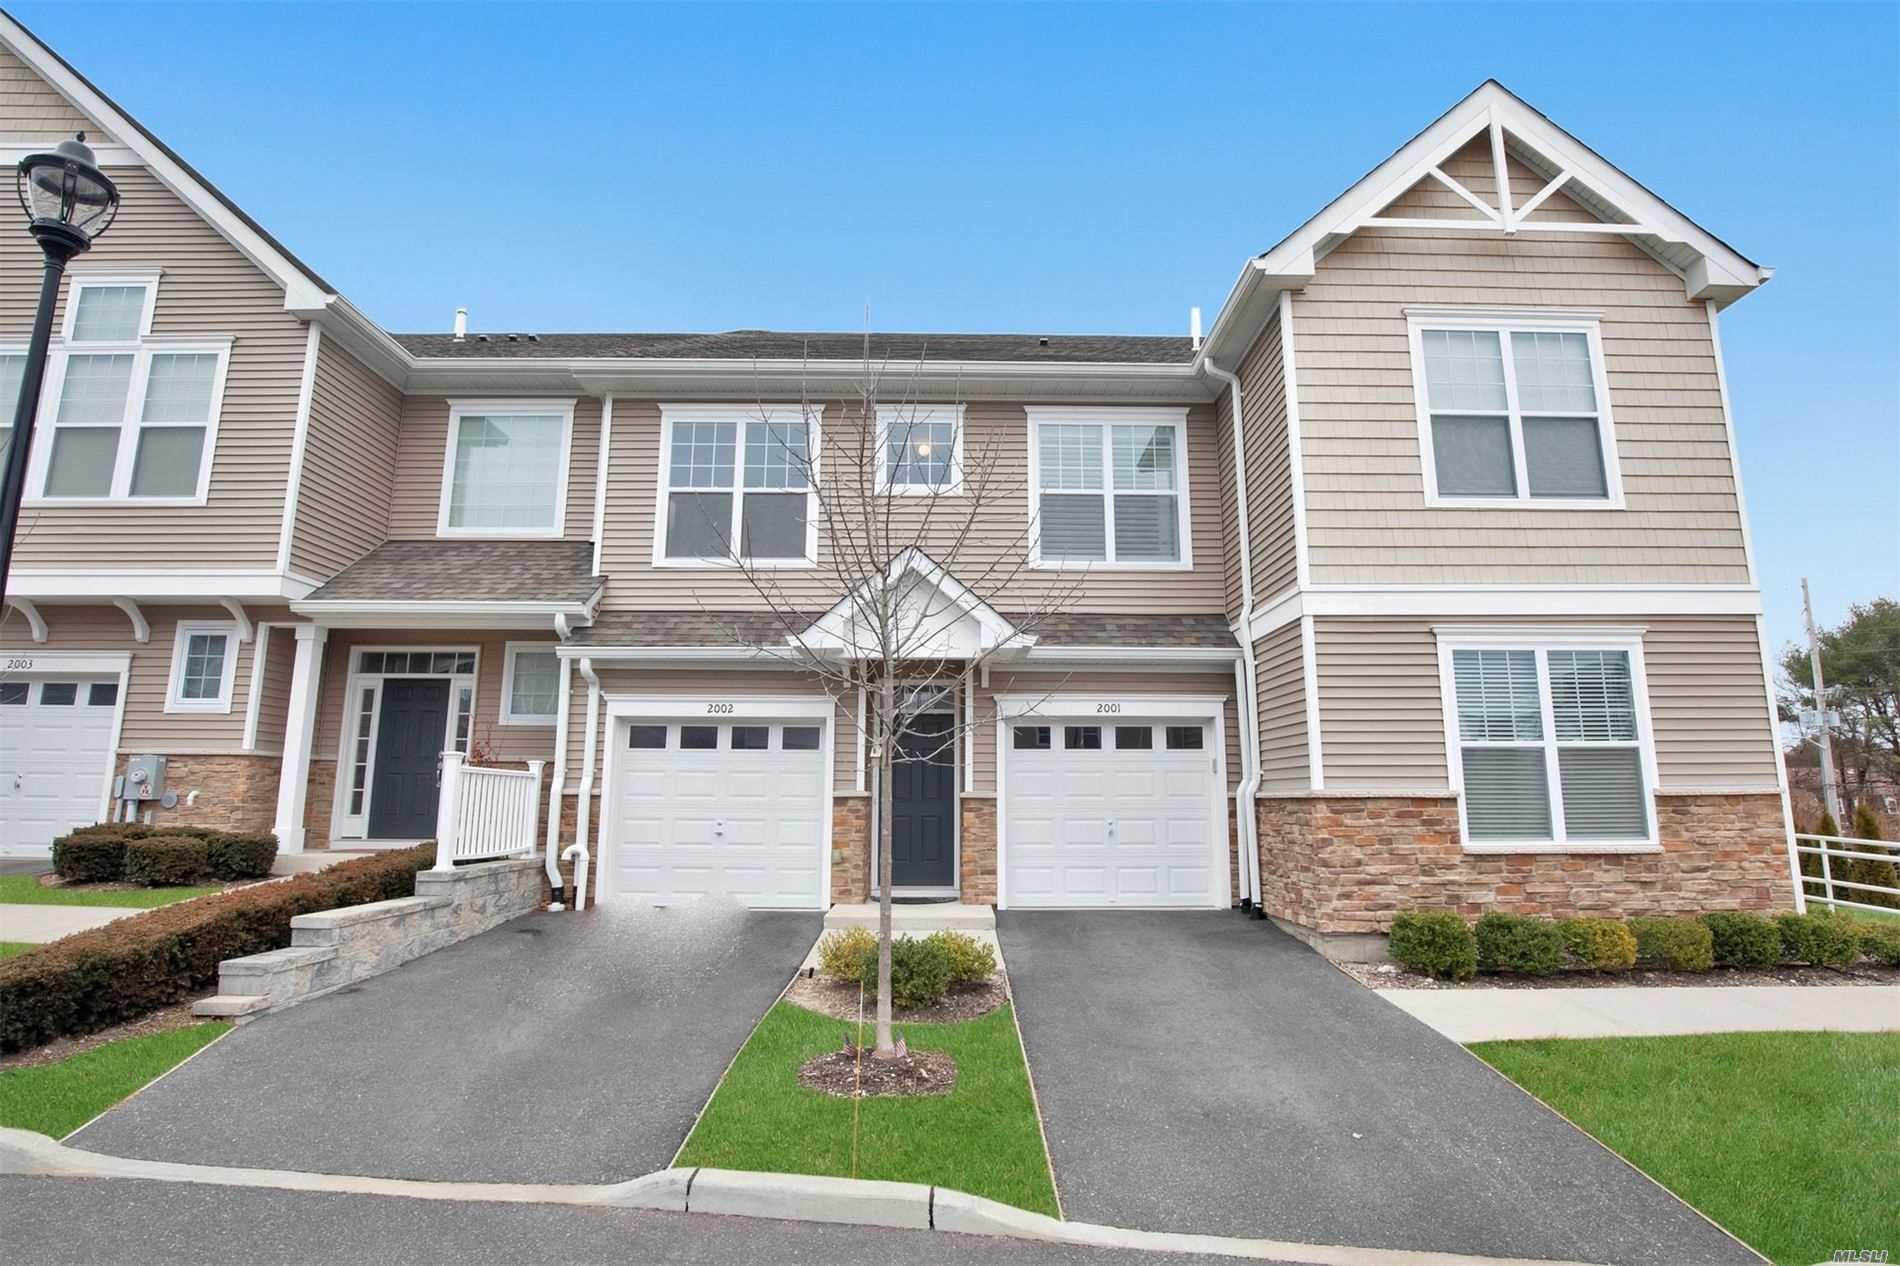 Property for sale at 2002 Townhome Way # B, Huntington Sta NY 11746, Huntington Sta,  New York 11746